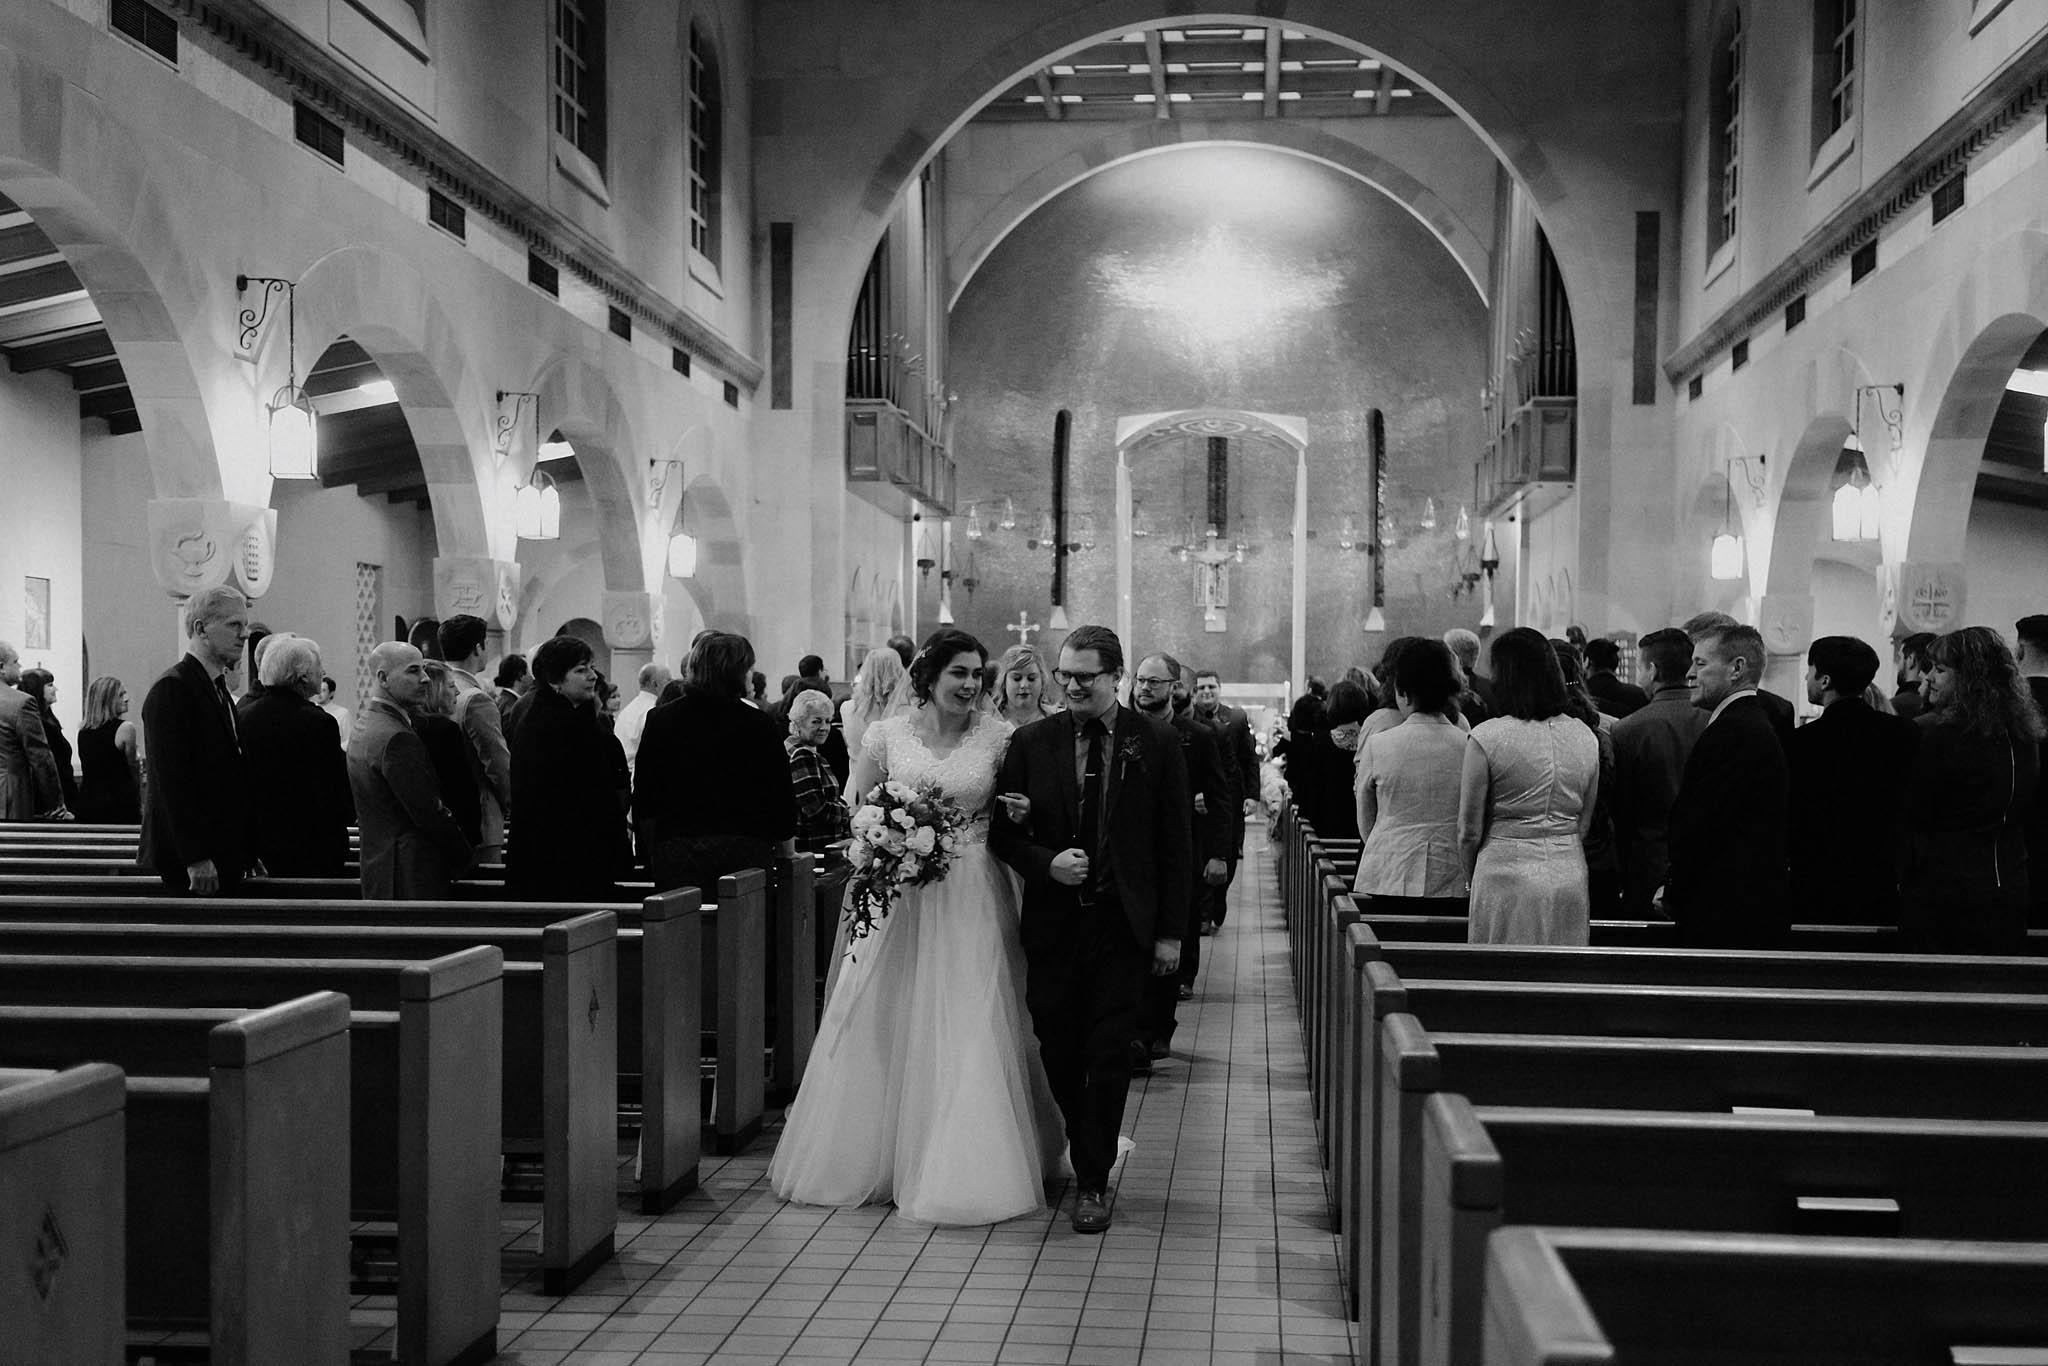 cincinnati warehouse wedding photographer cathedral church ceremony bride groom walking down aisle recession